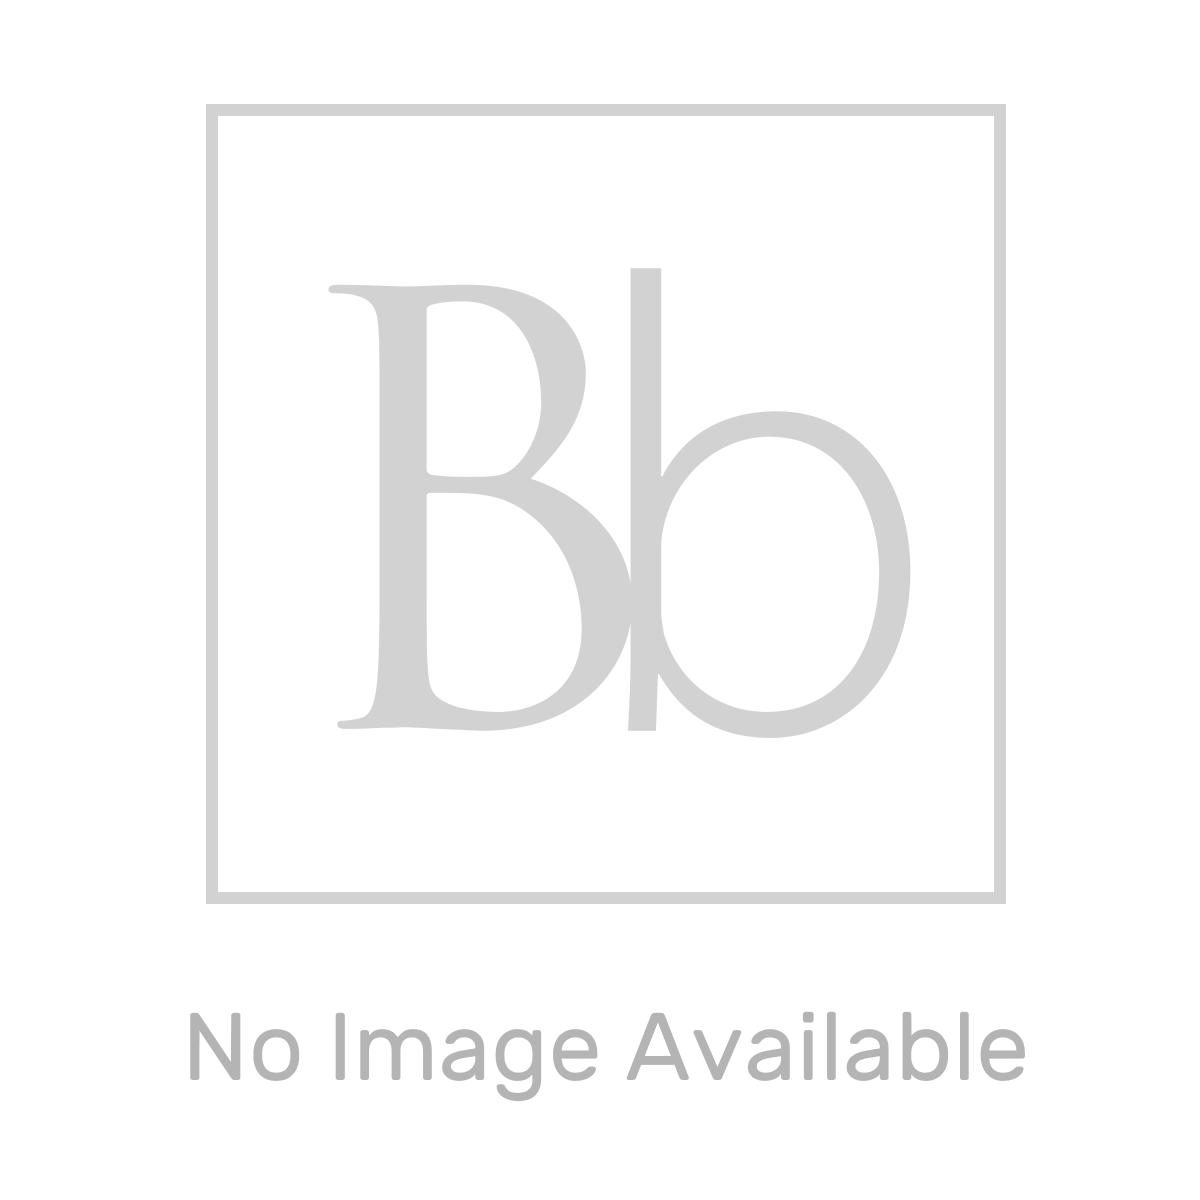 Aquadart White Slate Shower Tray 1600 x 800 Overhead